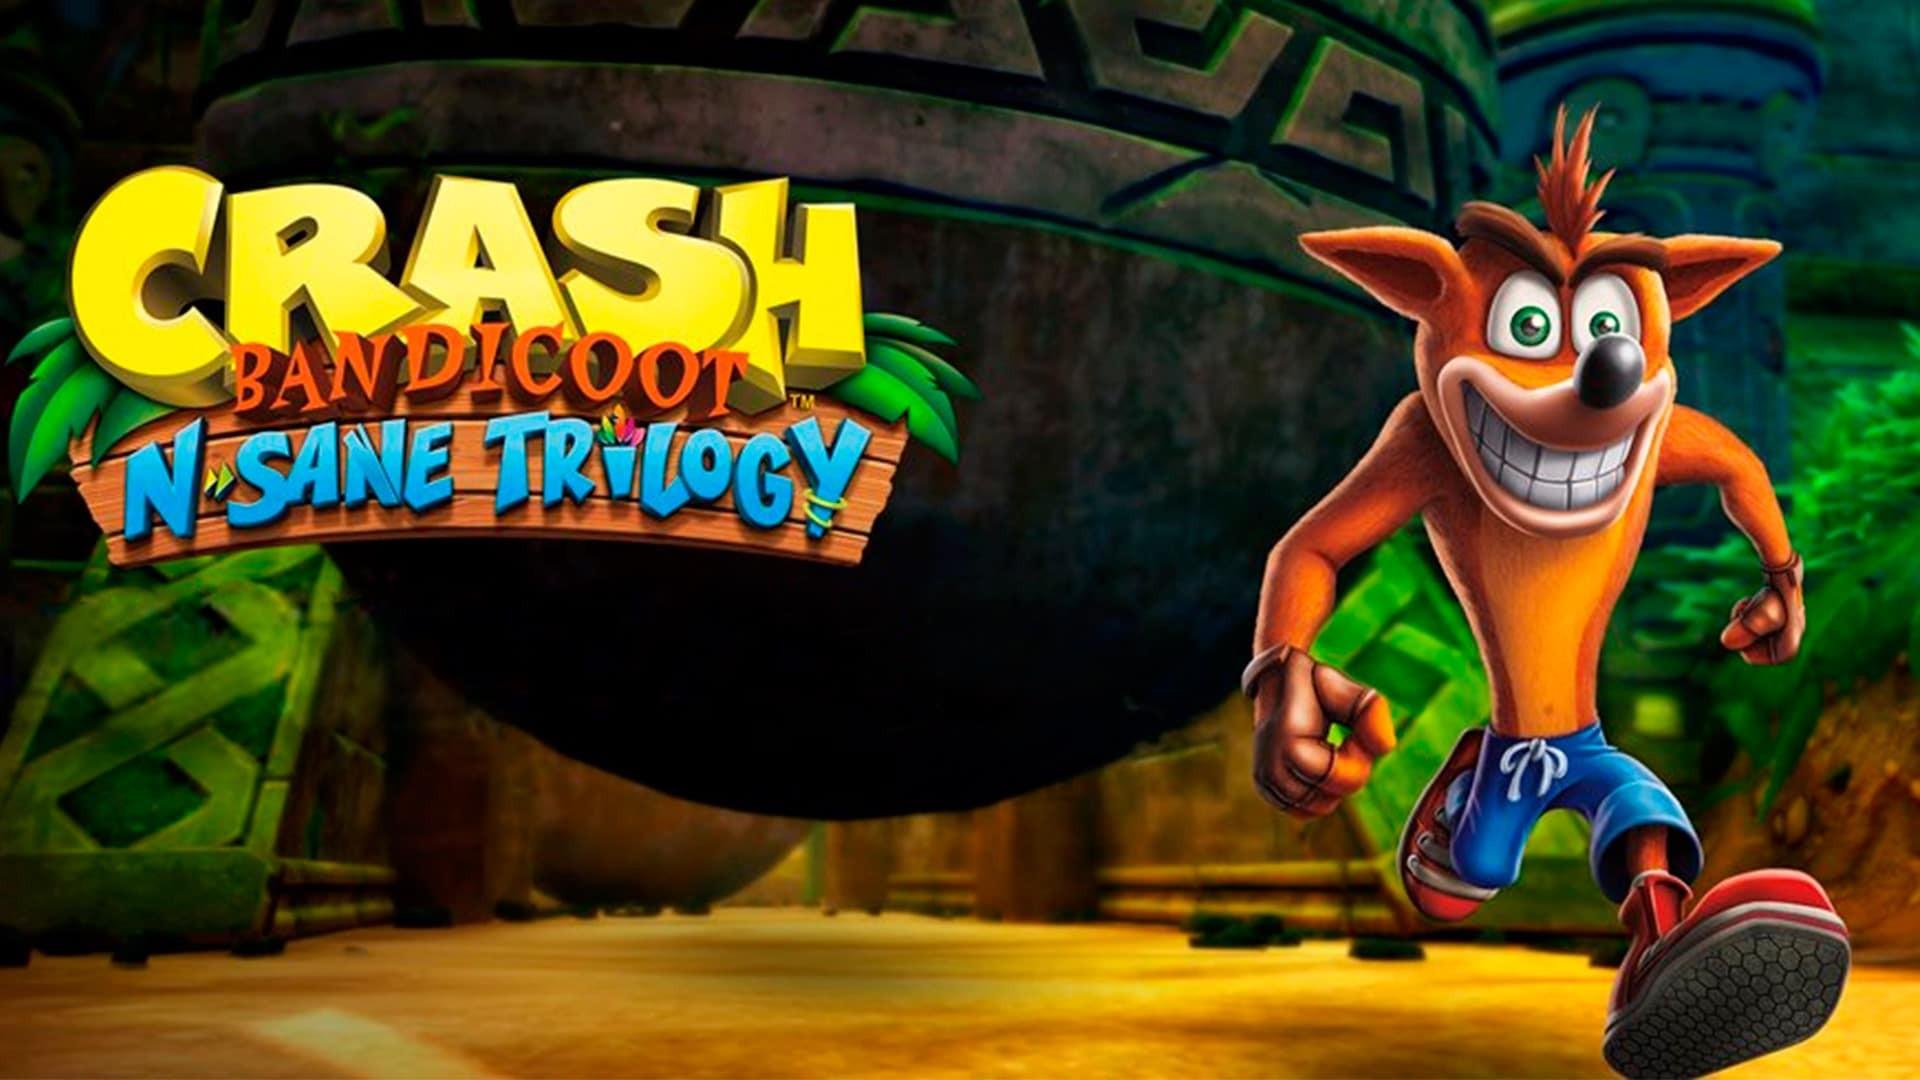 Crash Bandicoot N. Sane Trilogy Details + Wallpapers ...